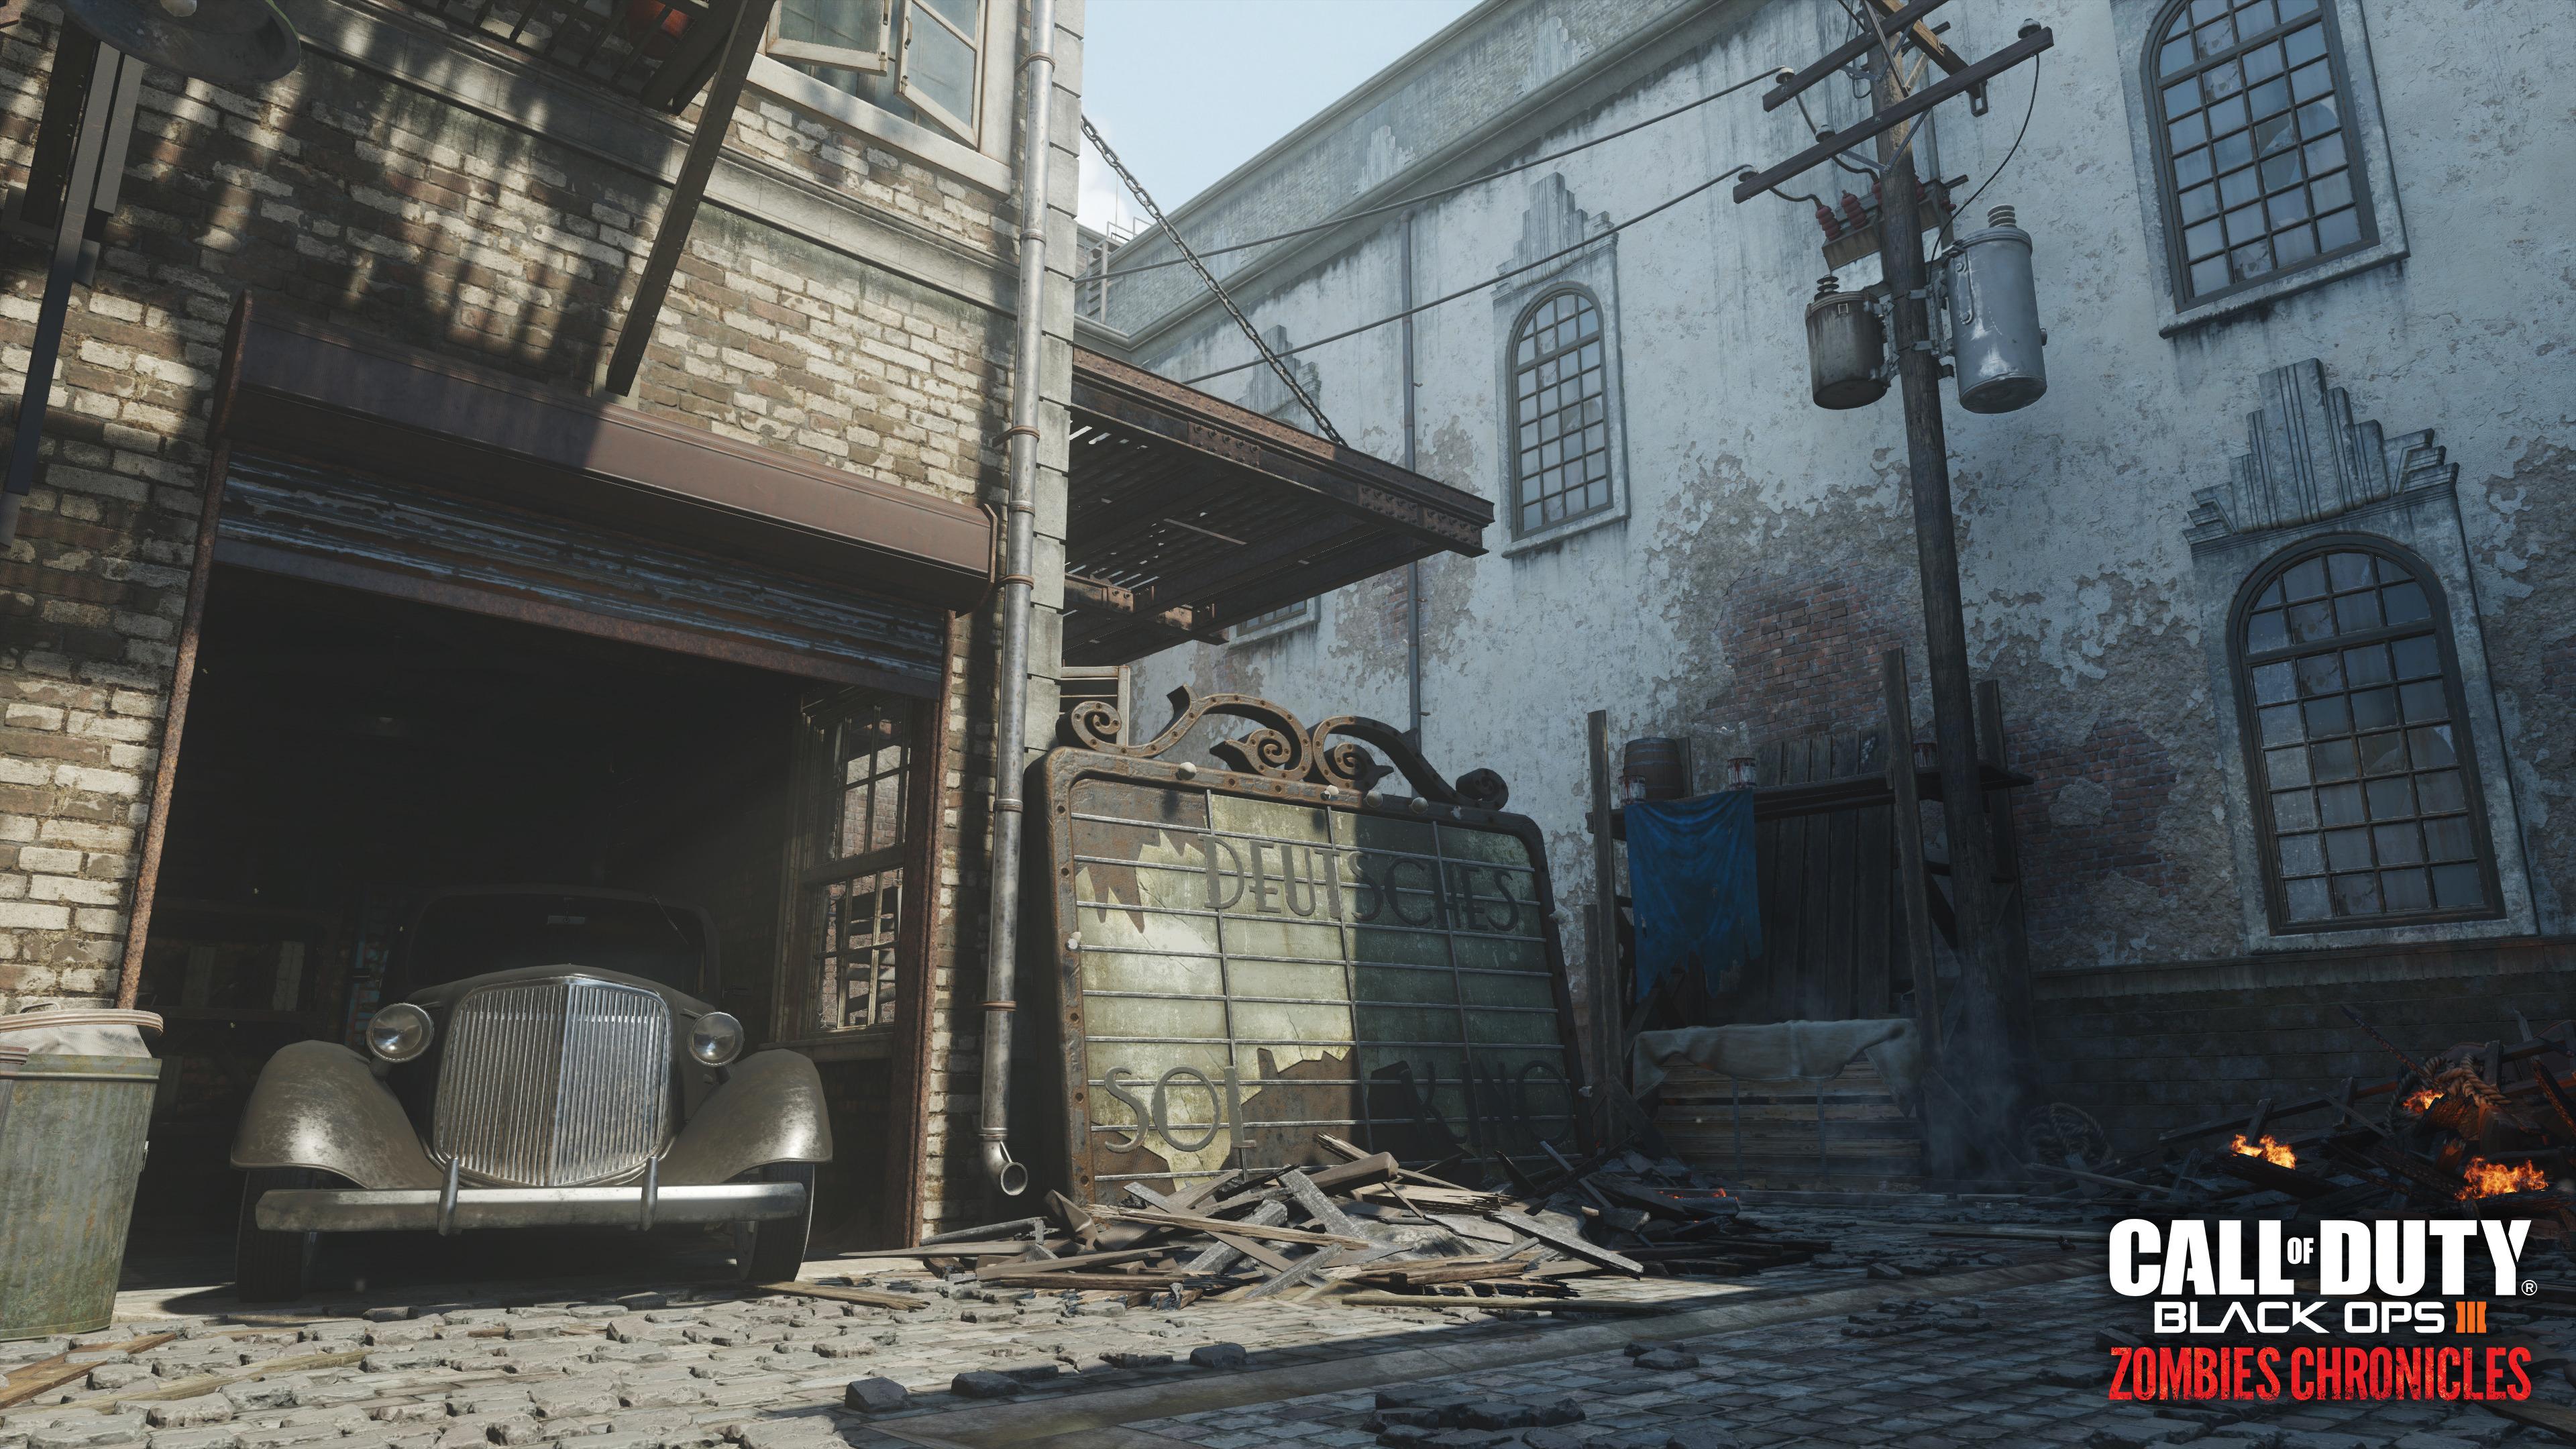 Vychází Call of Duty: Black Ops 3 - Zombies Chronicles pro PS4 144068